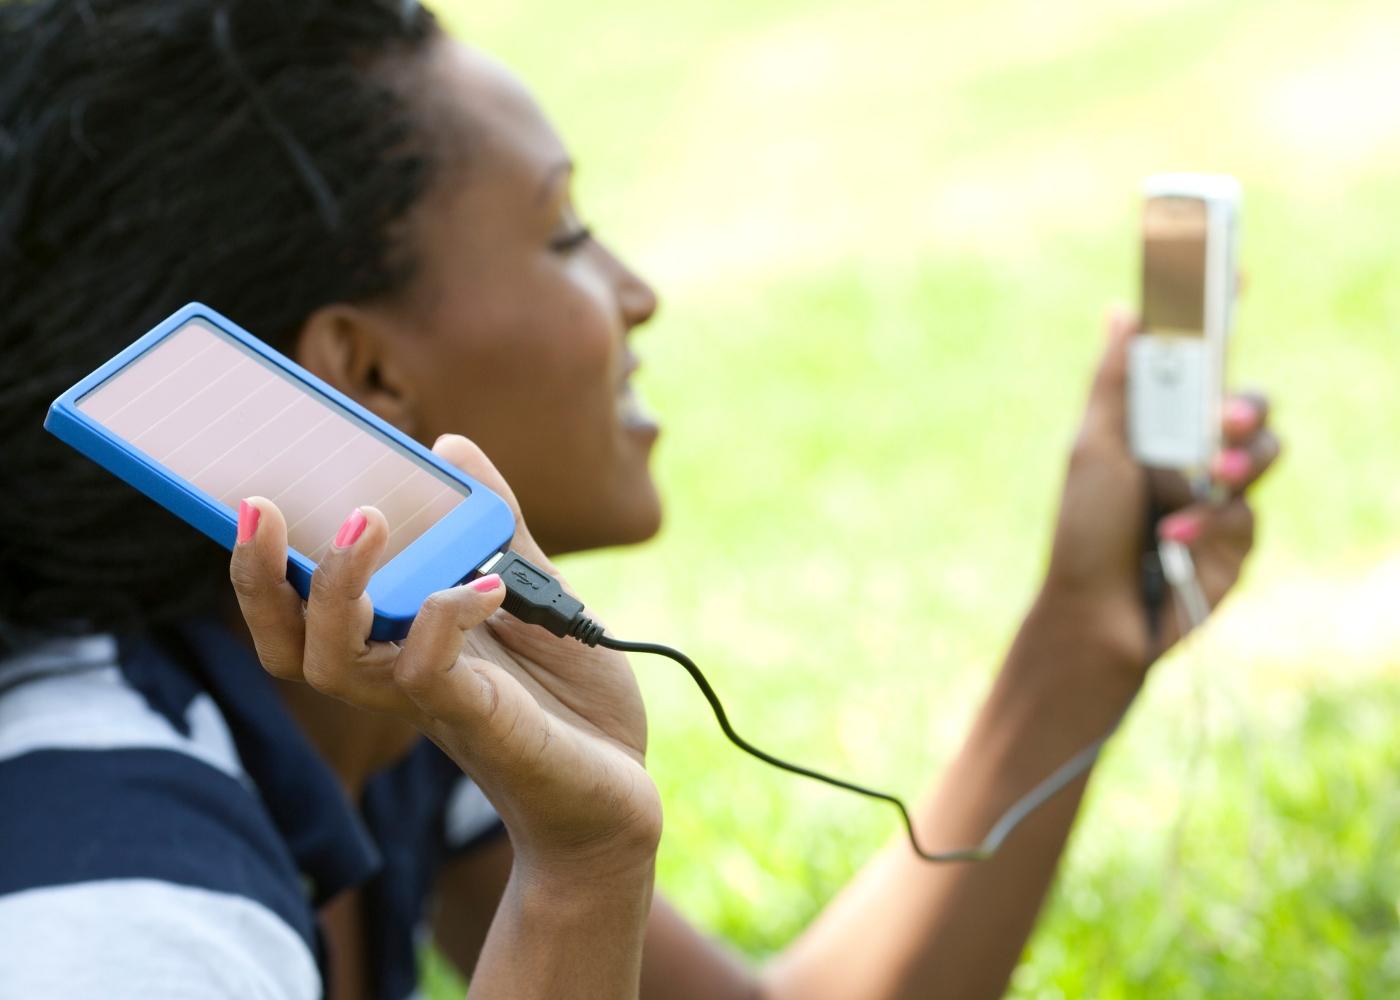 jovem a carregar telemóvel a energia solar